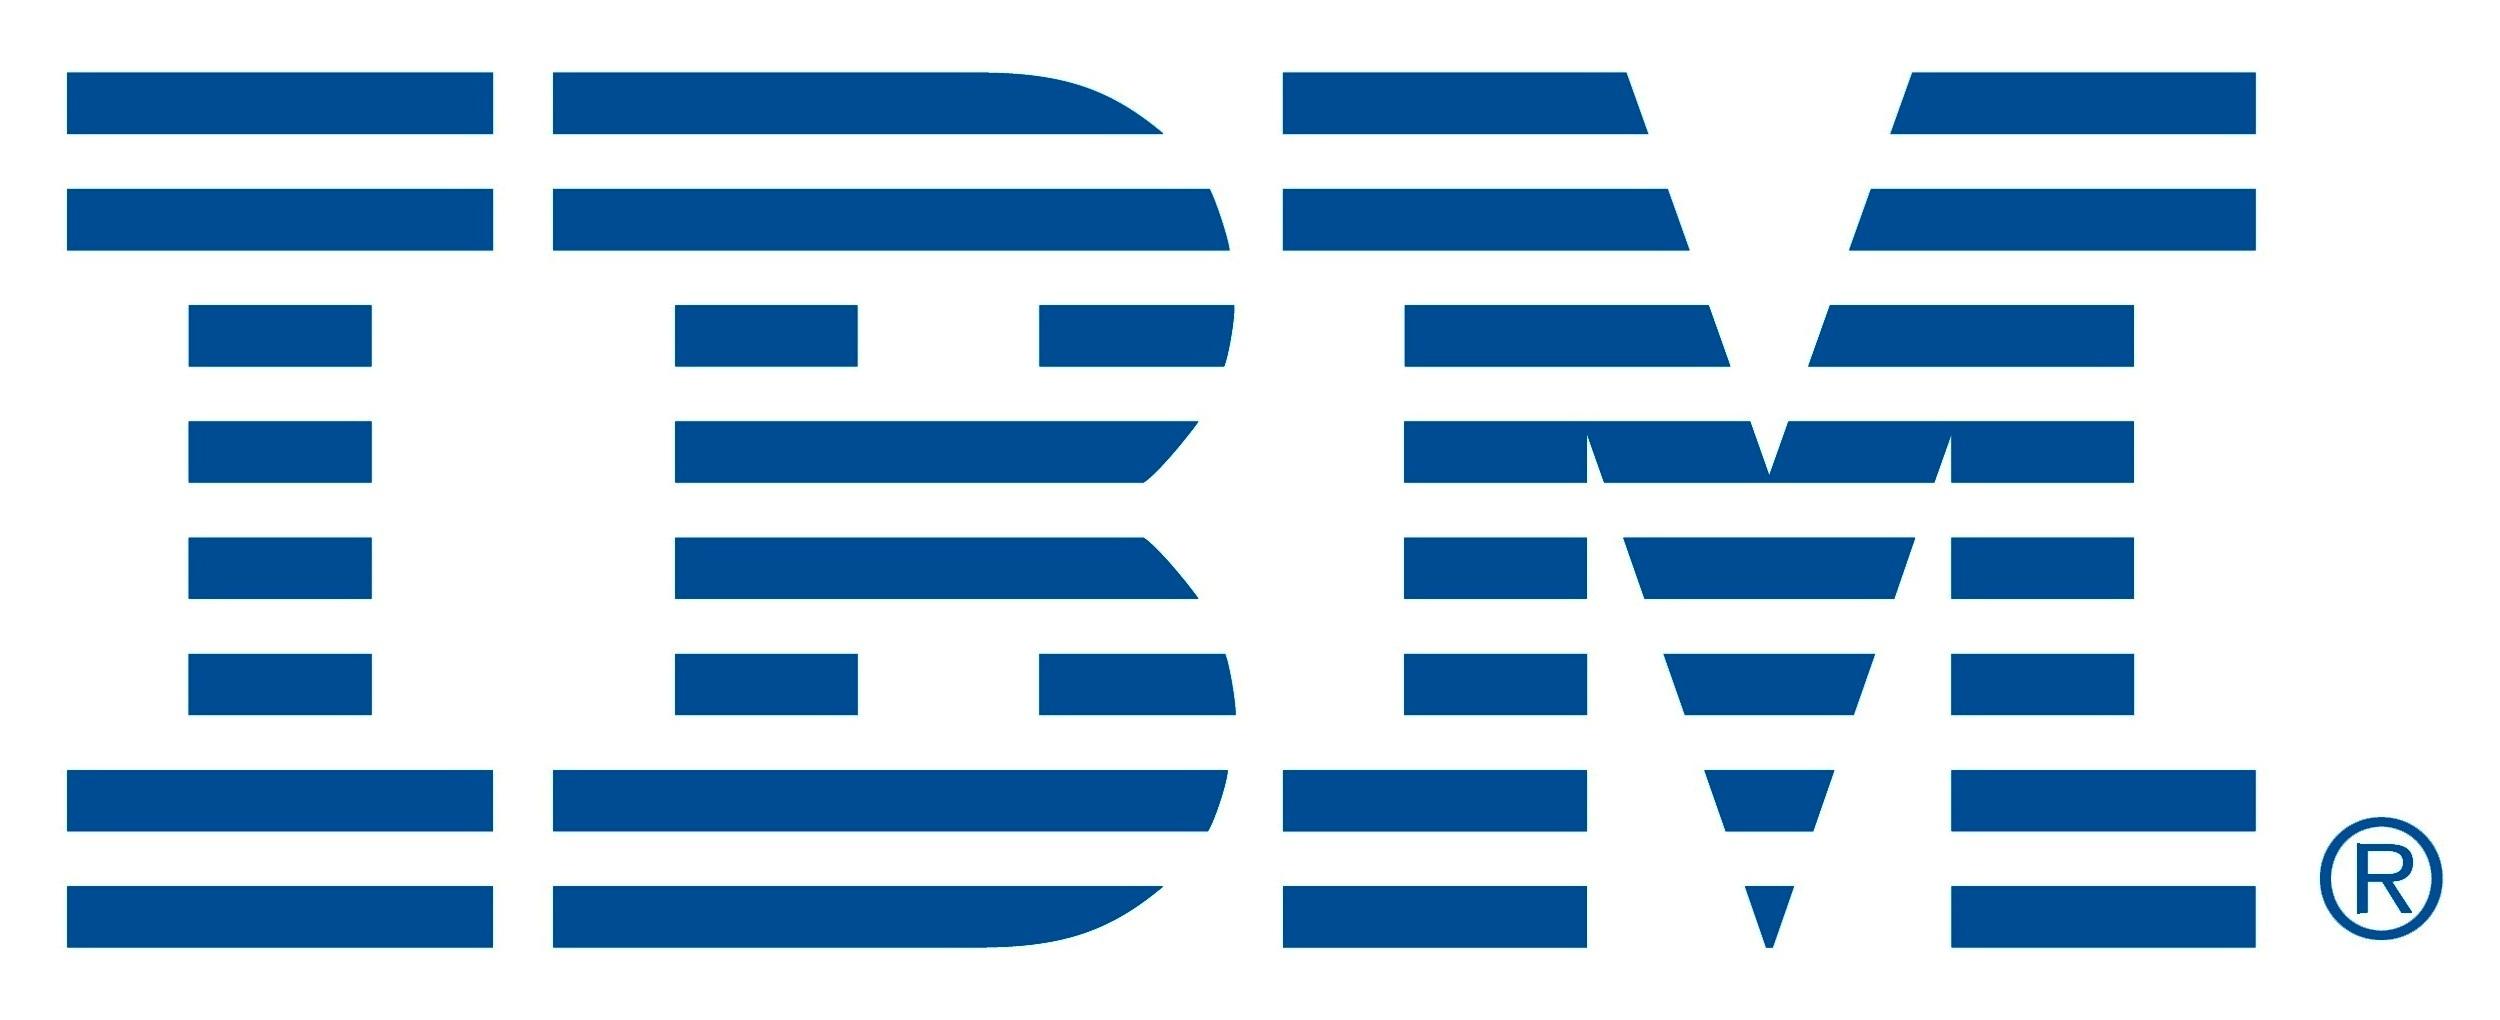 IBM Alliance · Microsoft Alliance · Oracle Partnership · HP partnership ·  Xamarin partnership - Ibm HD PNG